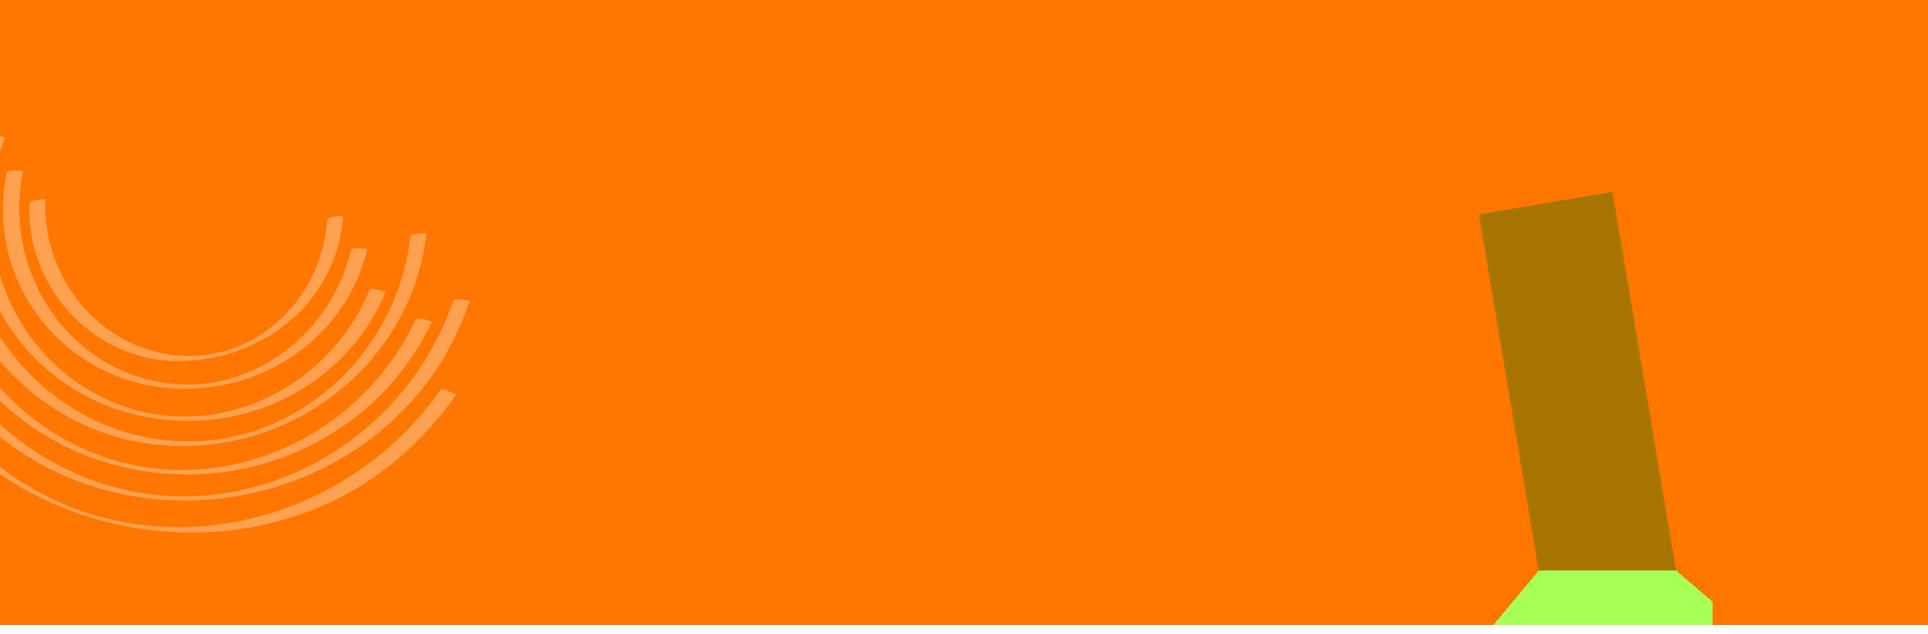 rettangolo01